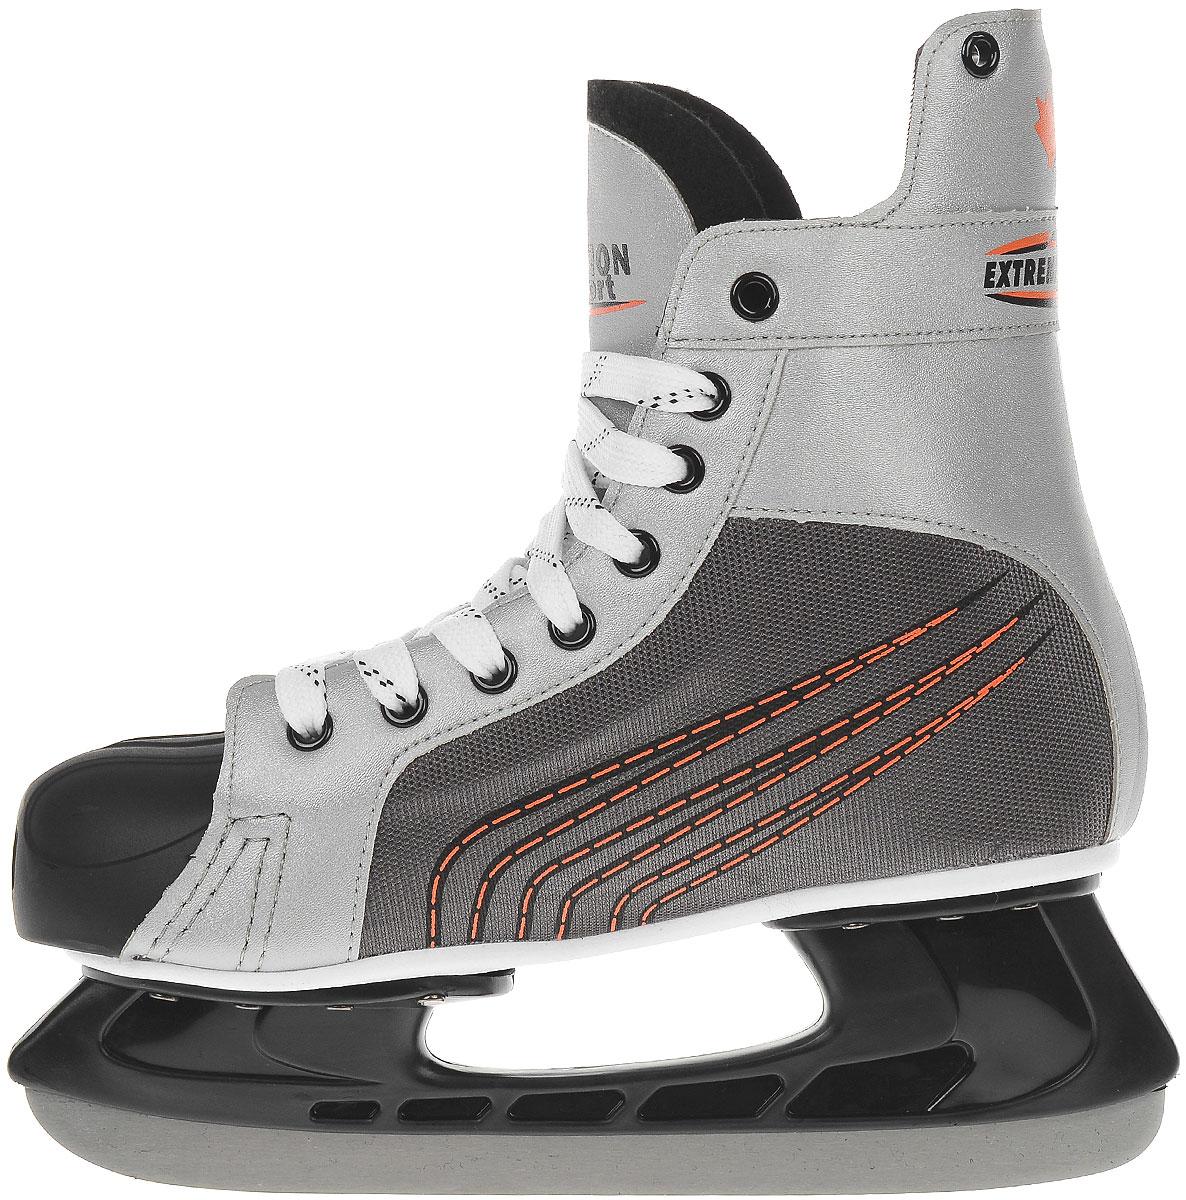 Коньки хоккейные мужские Action, цвет: белый, серый. PW-216N. Размер 43